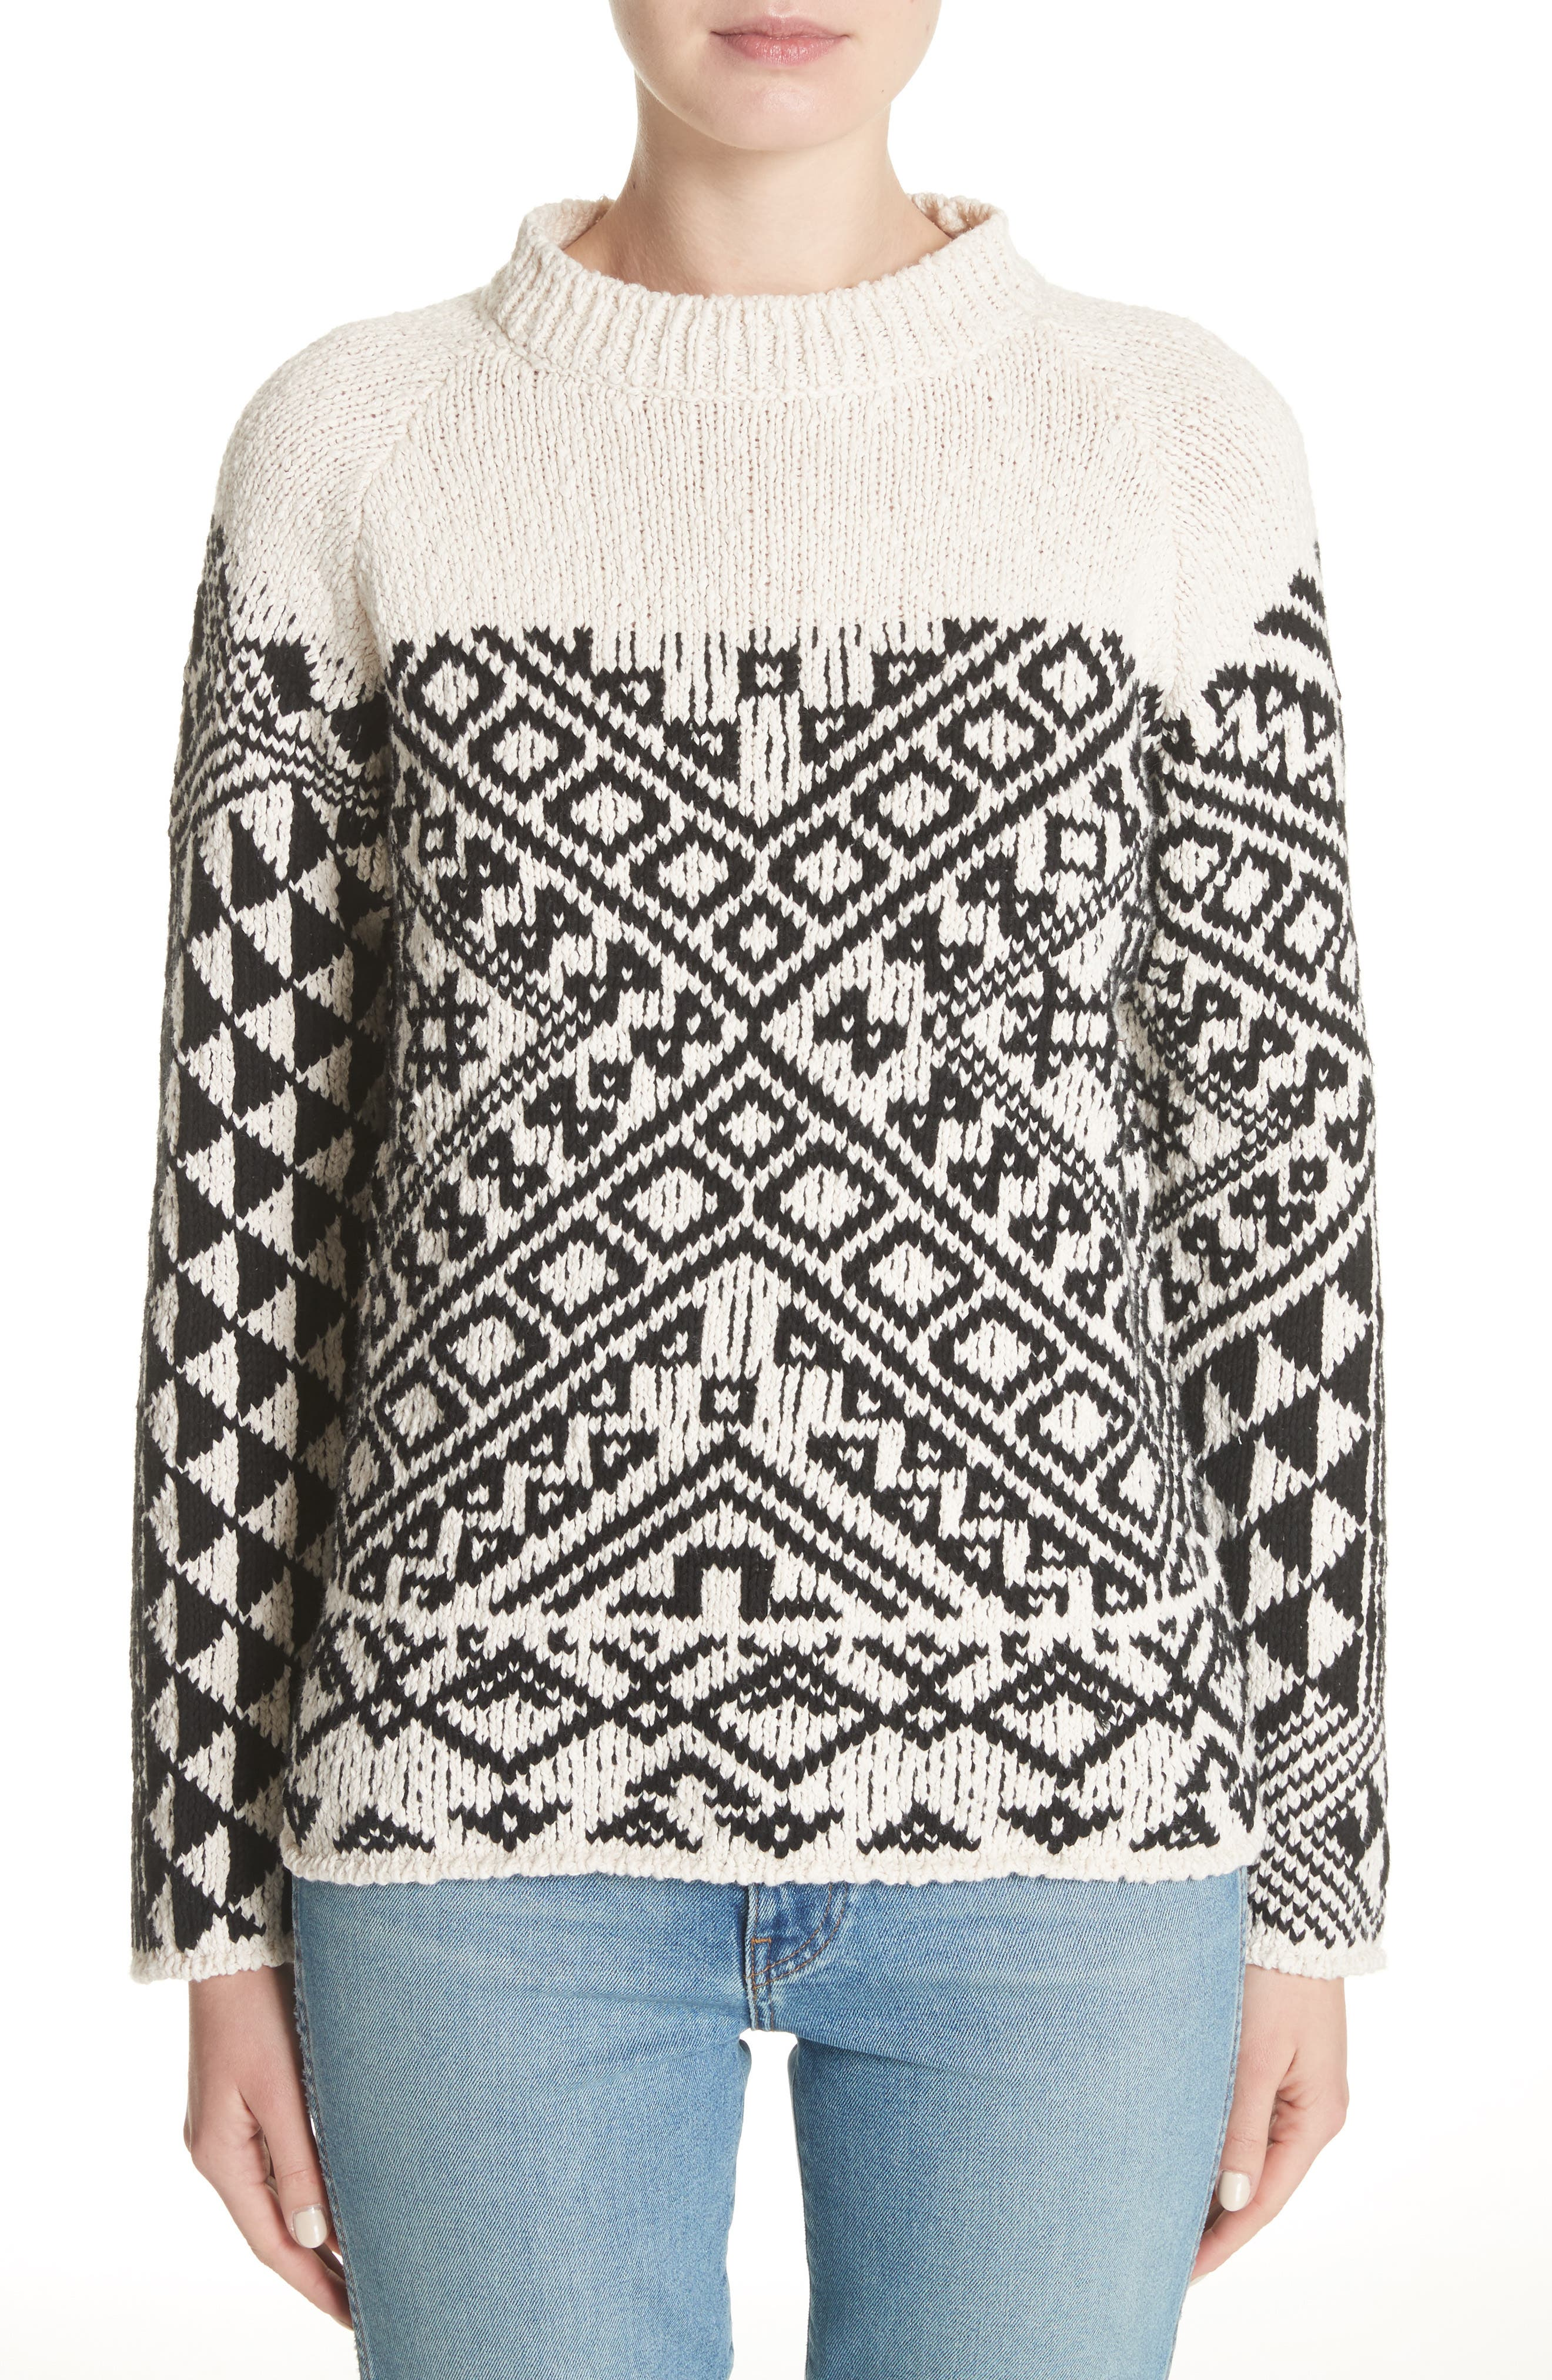 Rhia Jacquard Sweater,                             Main thumbnail 1, color,                             Off White/ Black